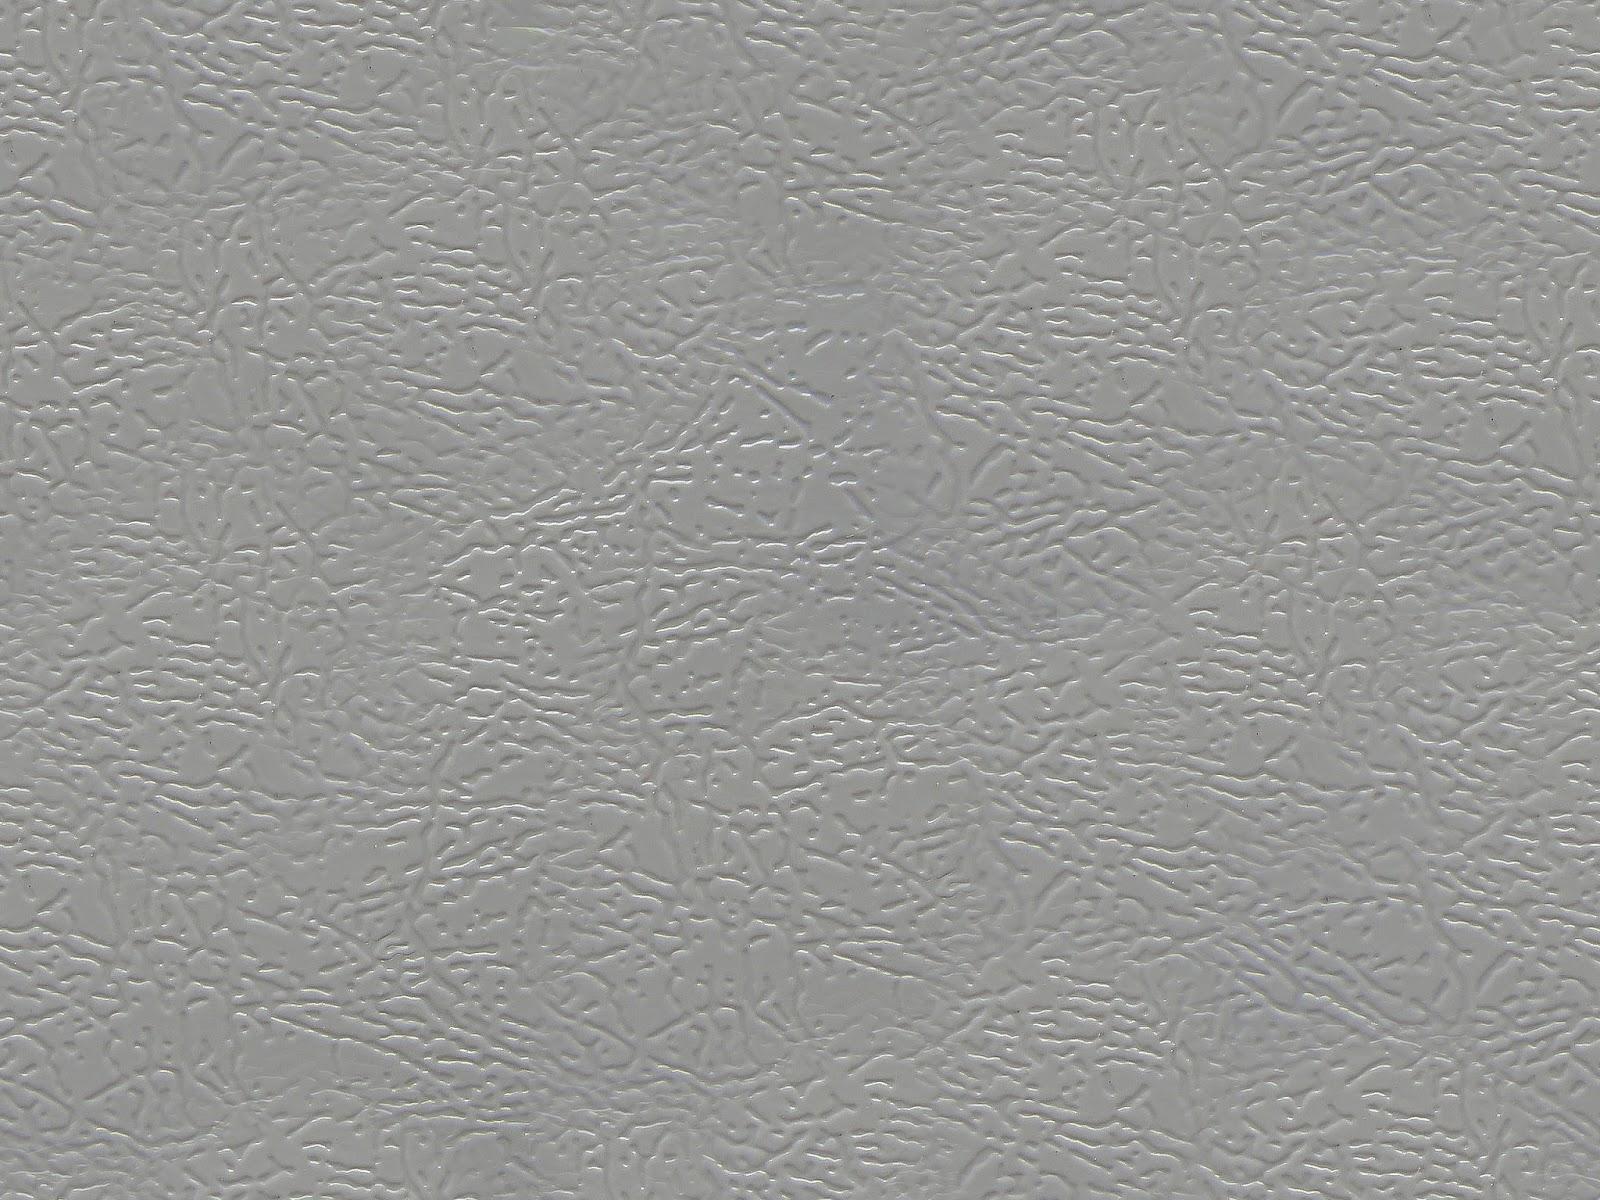 Seamless Plastic Veins Texture Maps Texturise Free